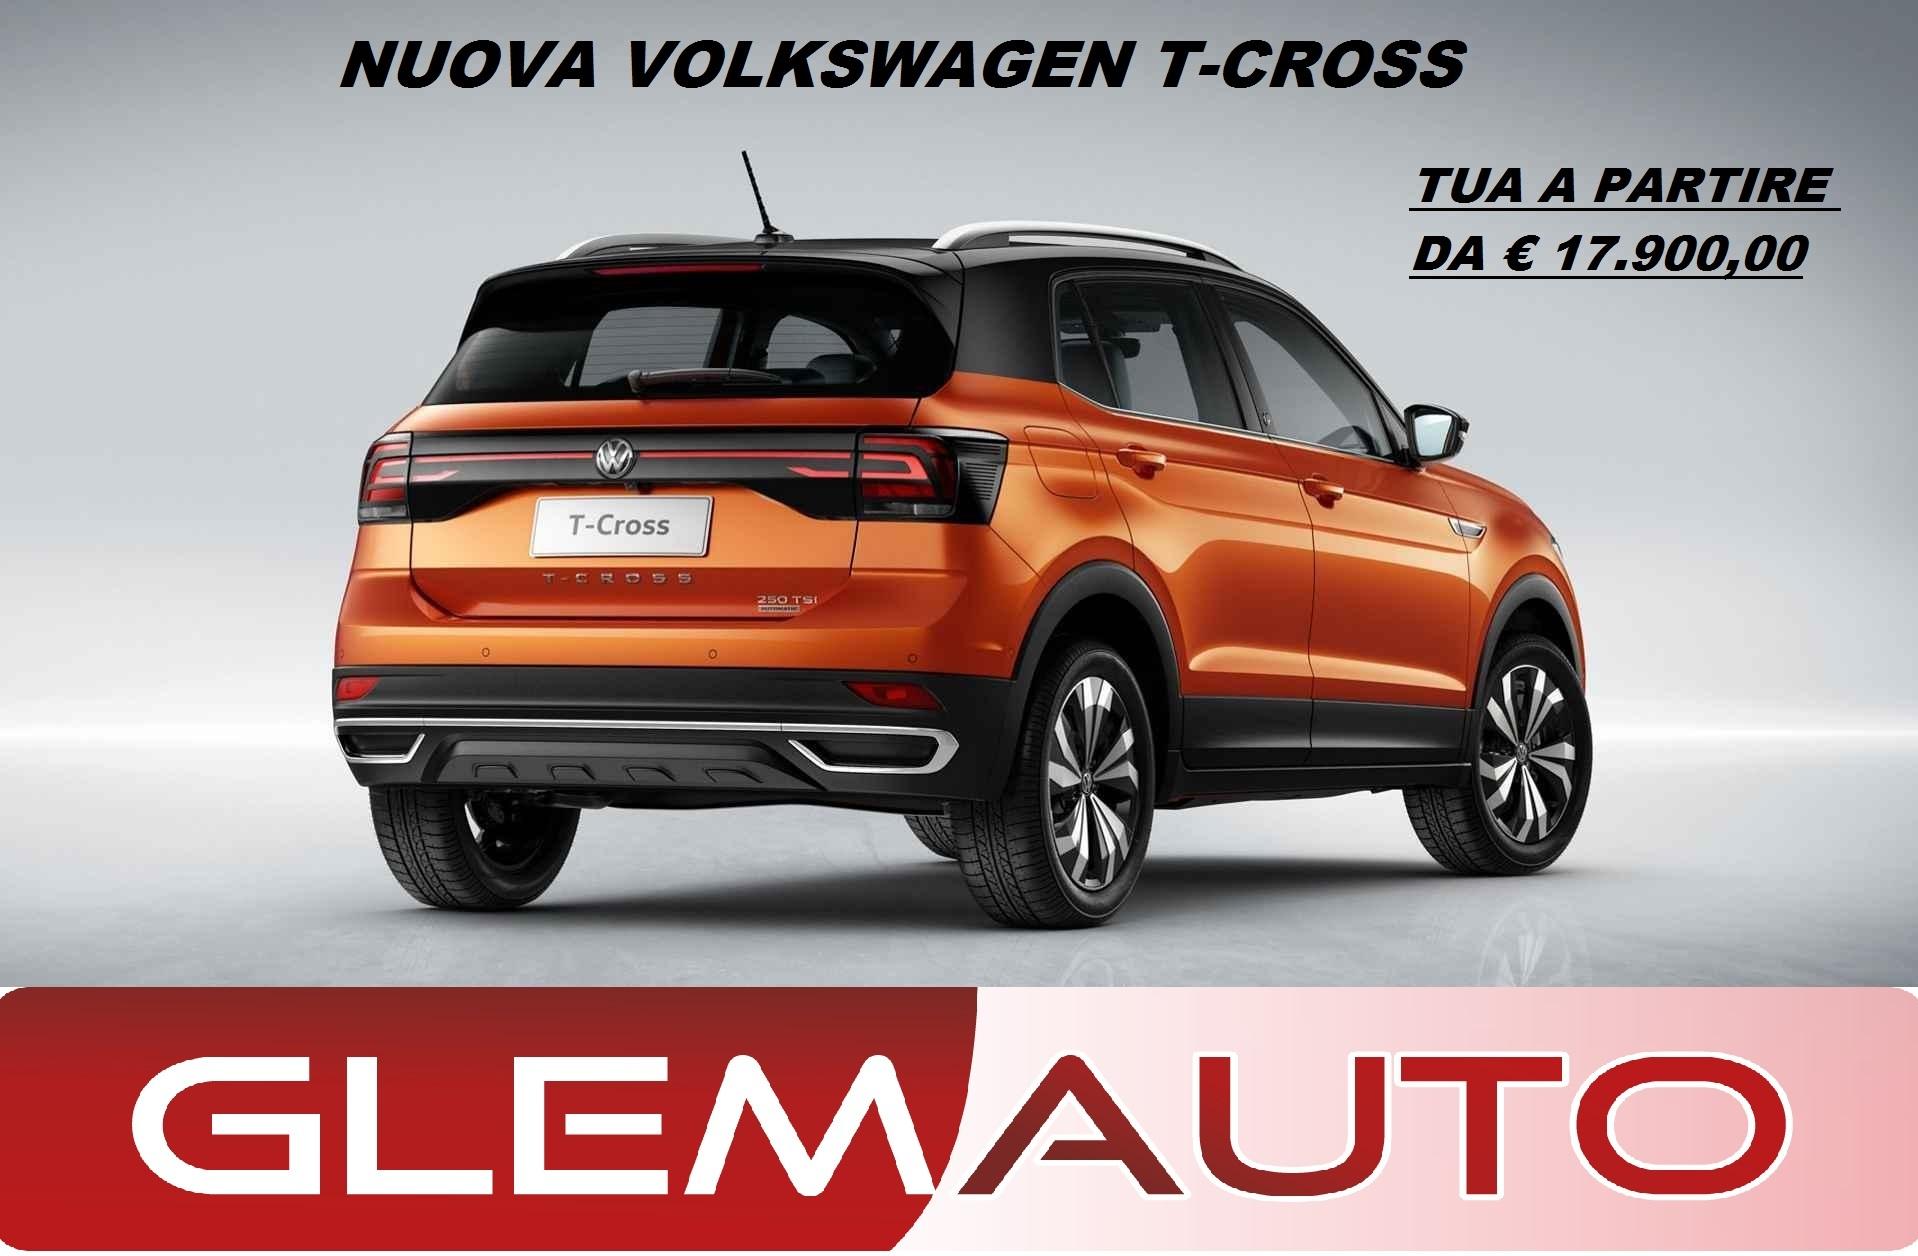 173883507_volkswagen-t-cross-brasil(8).jpg.8f9f513da8c859a3aa2dc787ac44bb26